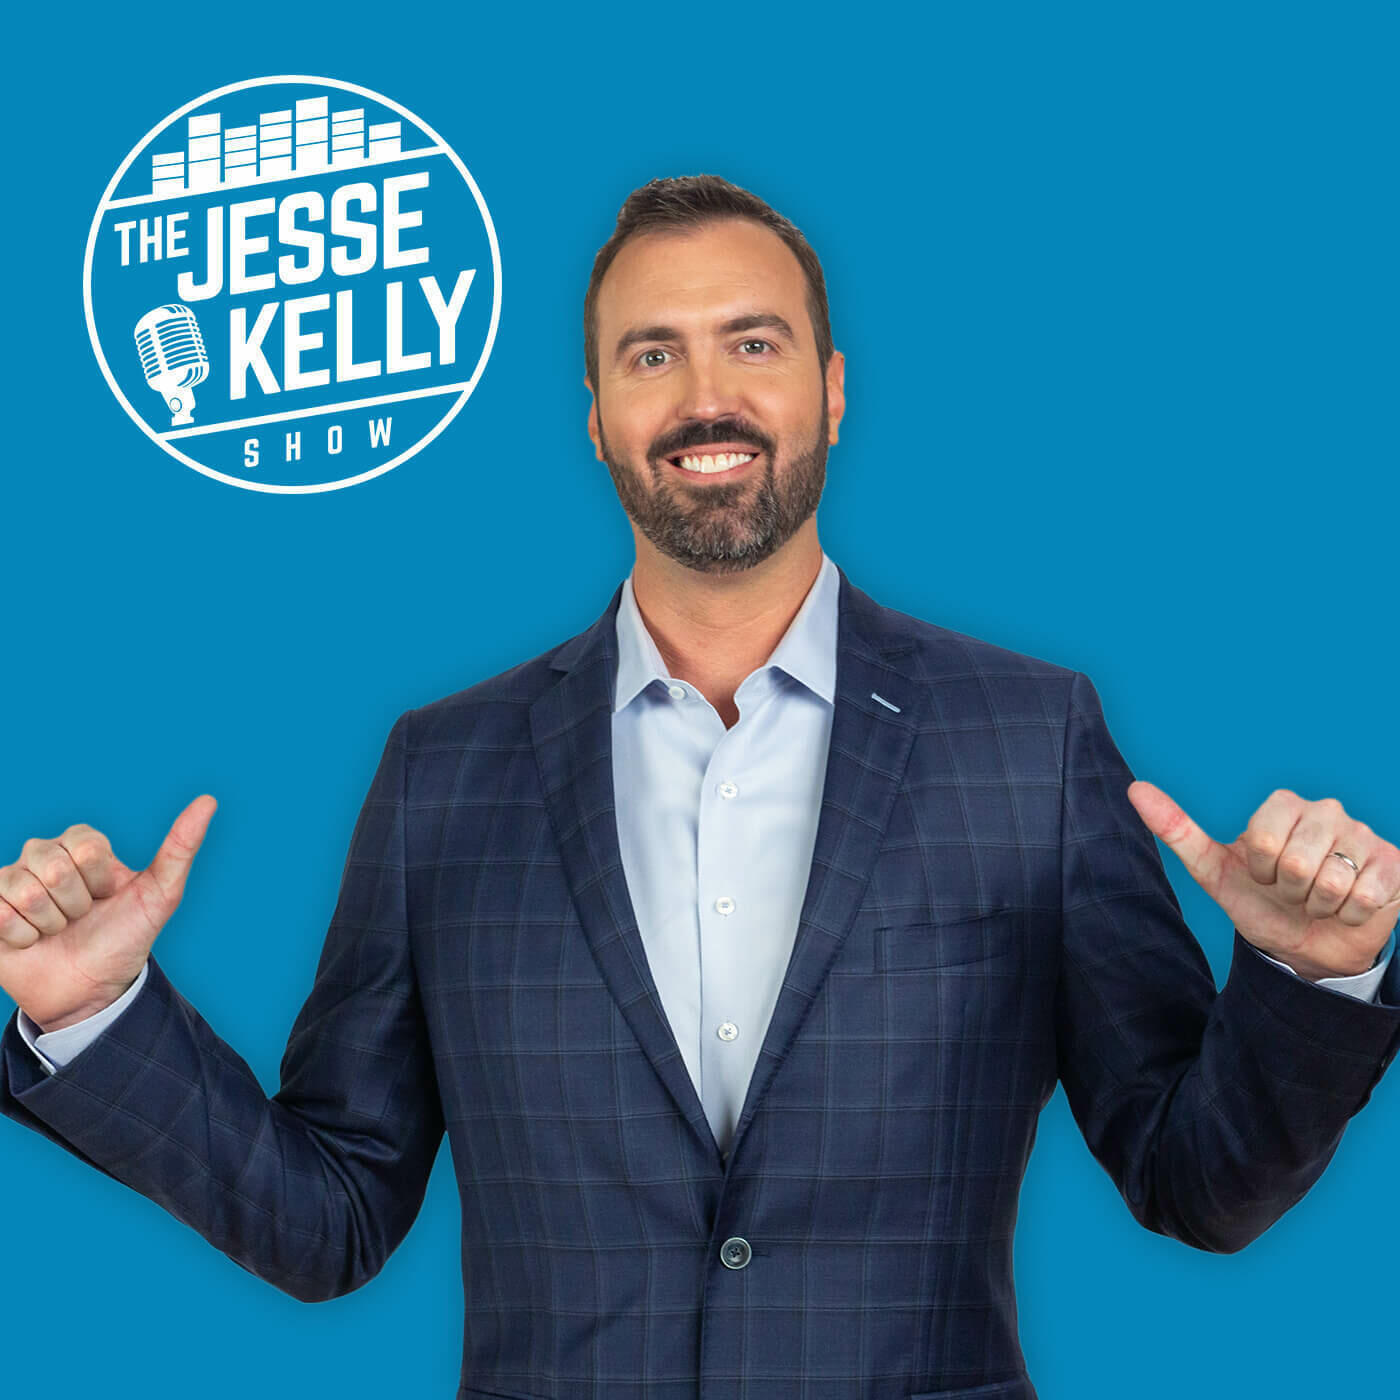 The Jesse Kelly Show